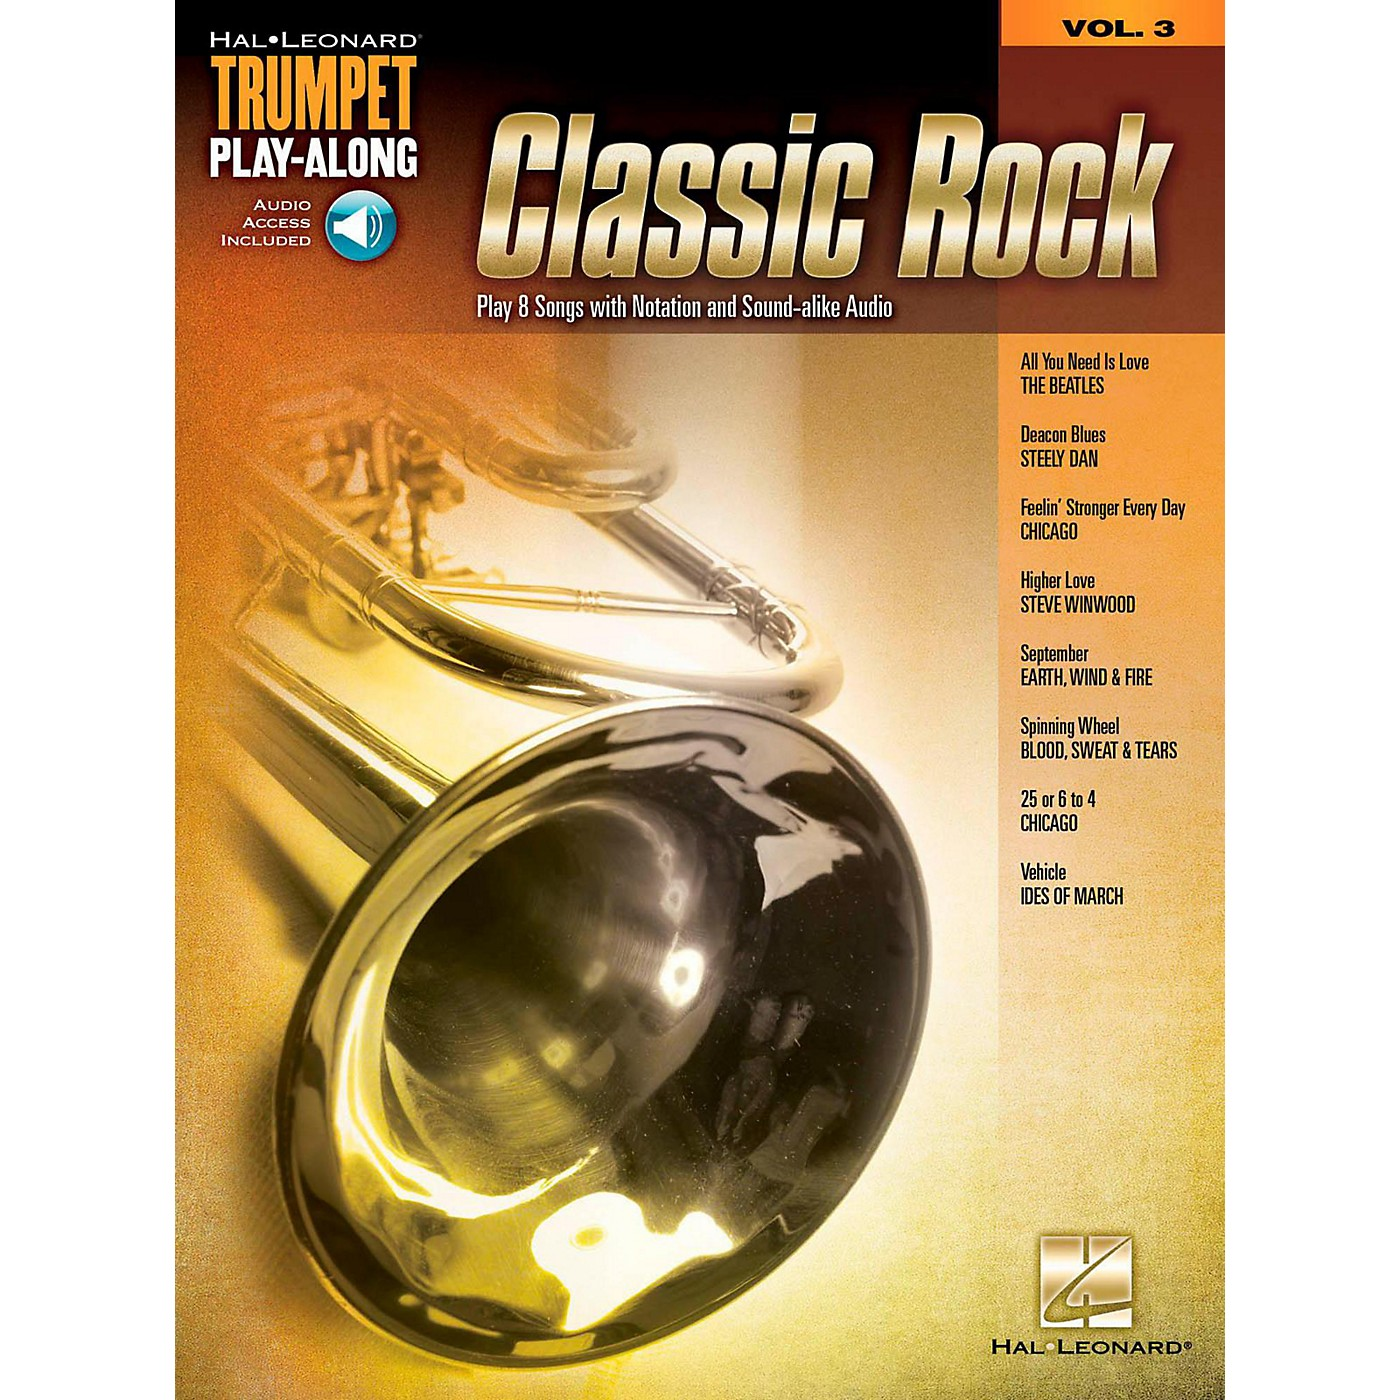 Hal Leonard Classic Rock - Trumpet Play-Along Volume 3 Book/Audio Online thumbnail